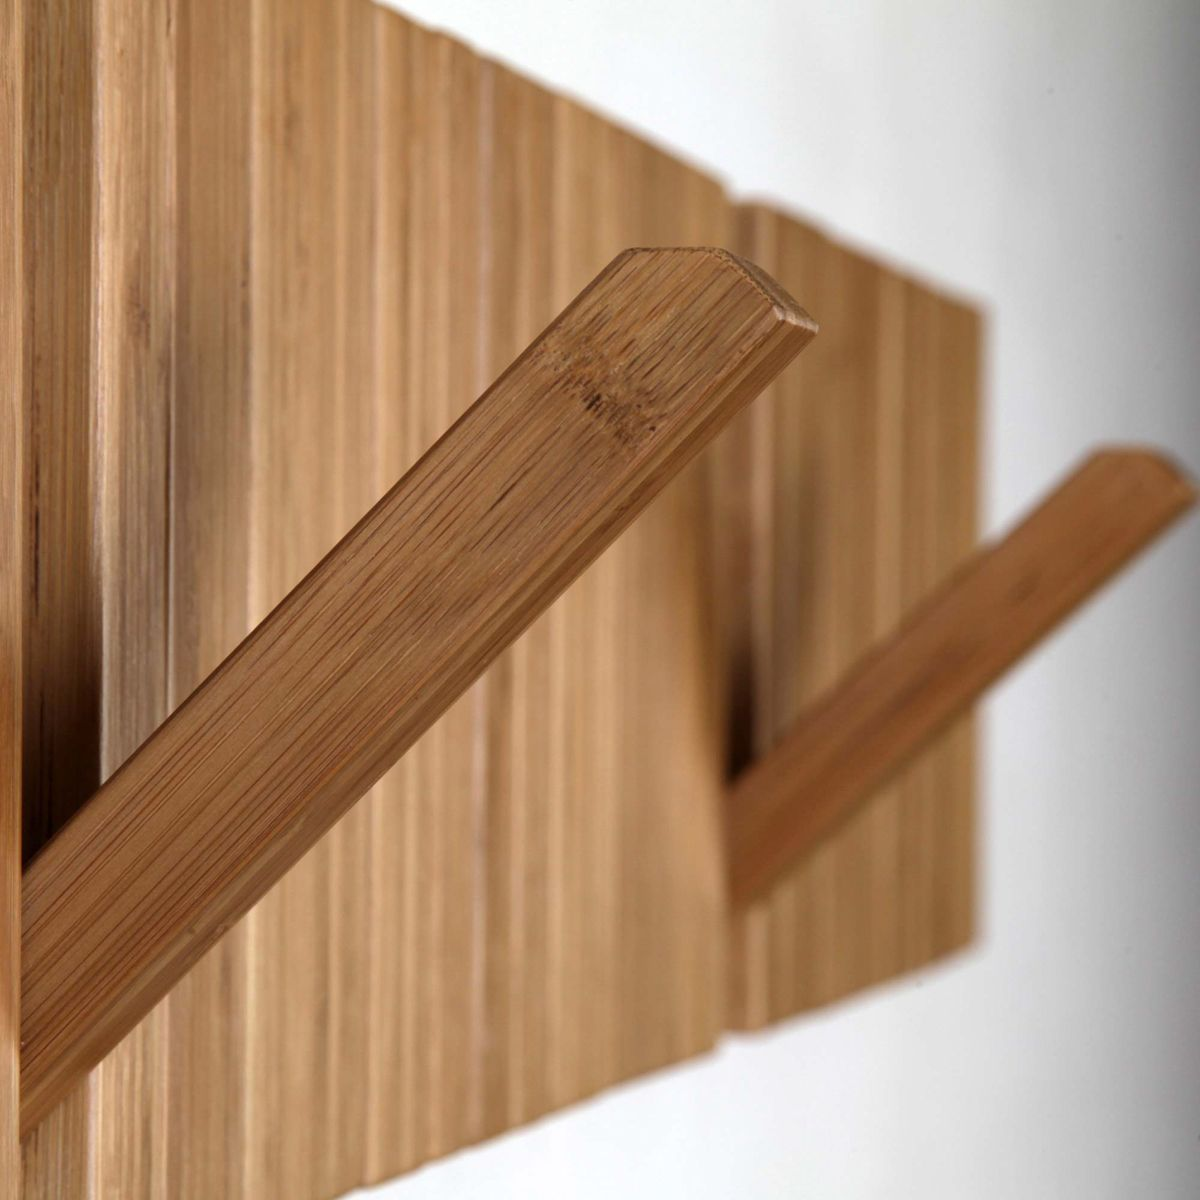 pianoforte coat rack nolita store rack design. Black Bedroom Furniture Sets. Home Design Ideas